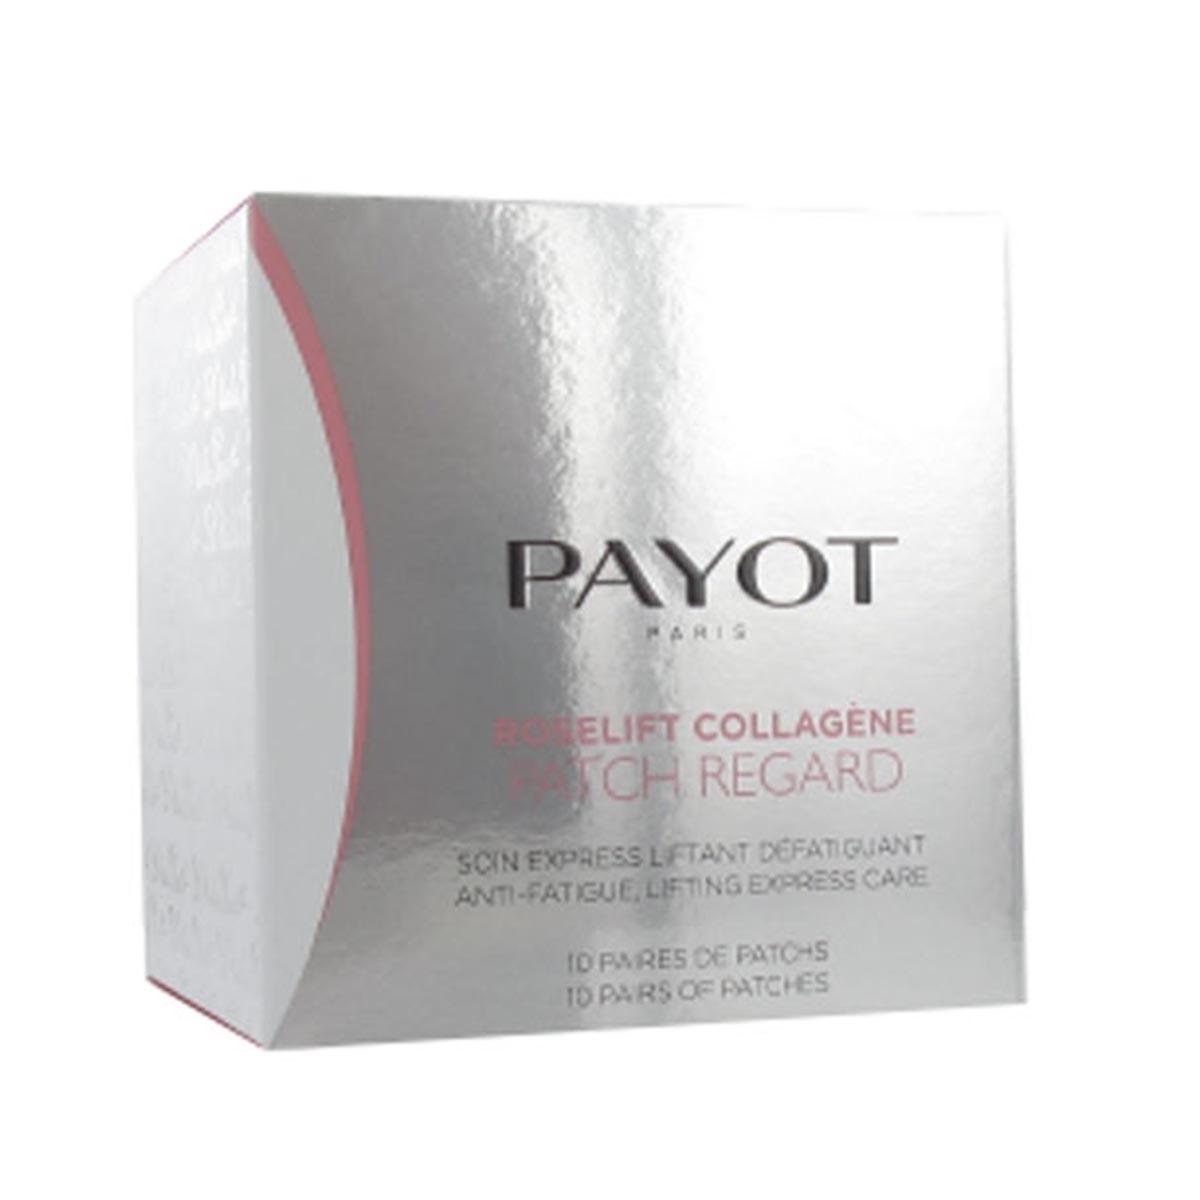 Payot paris roselift collagene patch regard 10uds